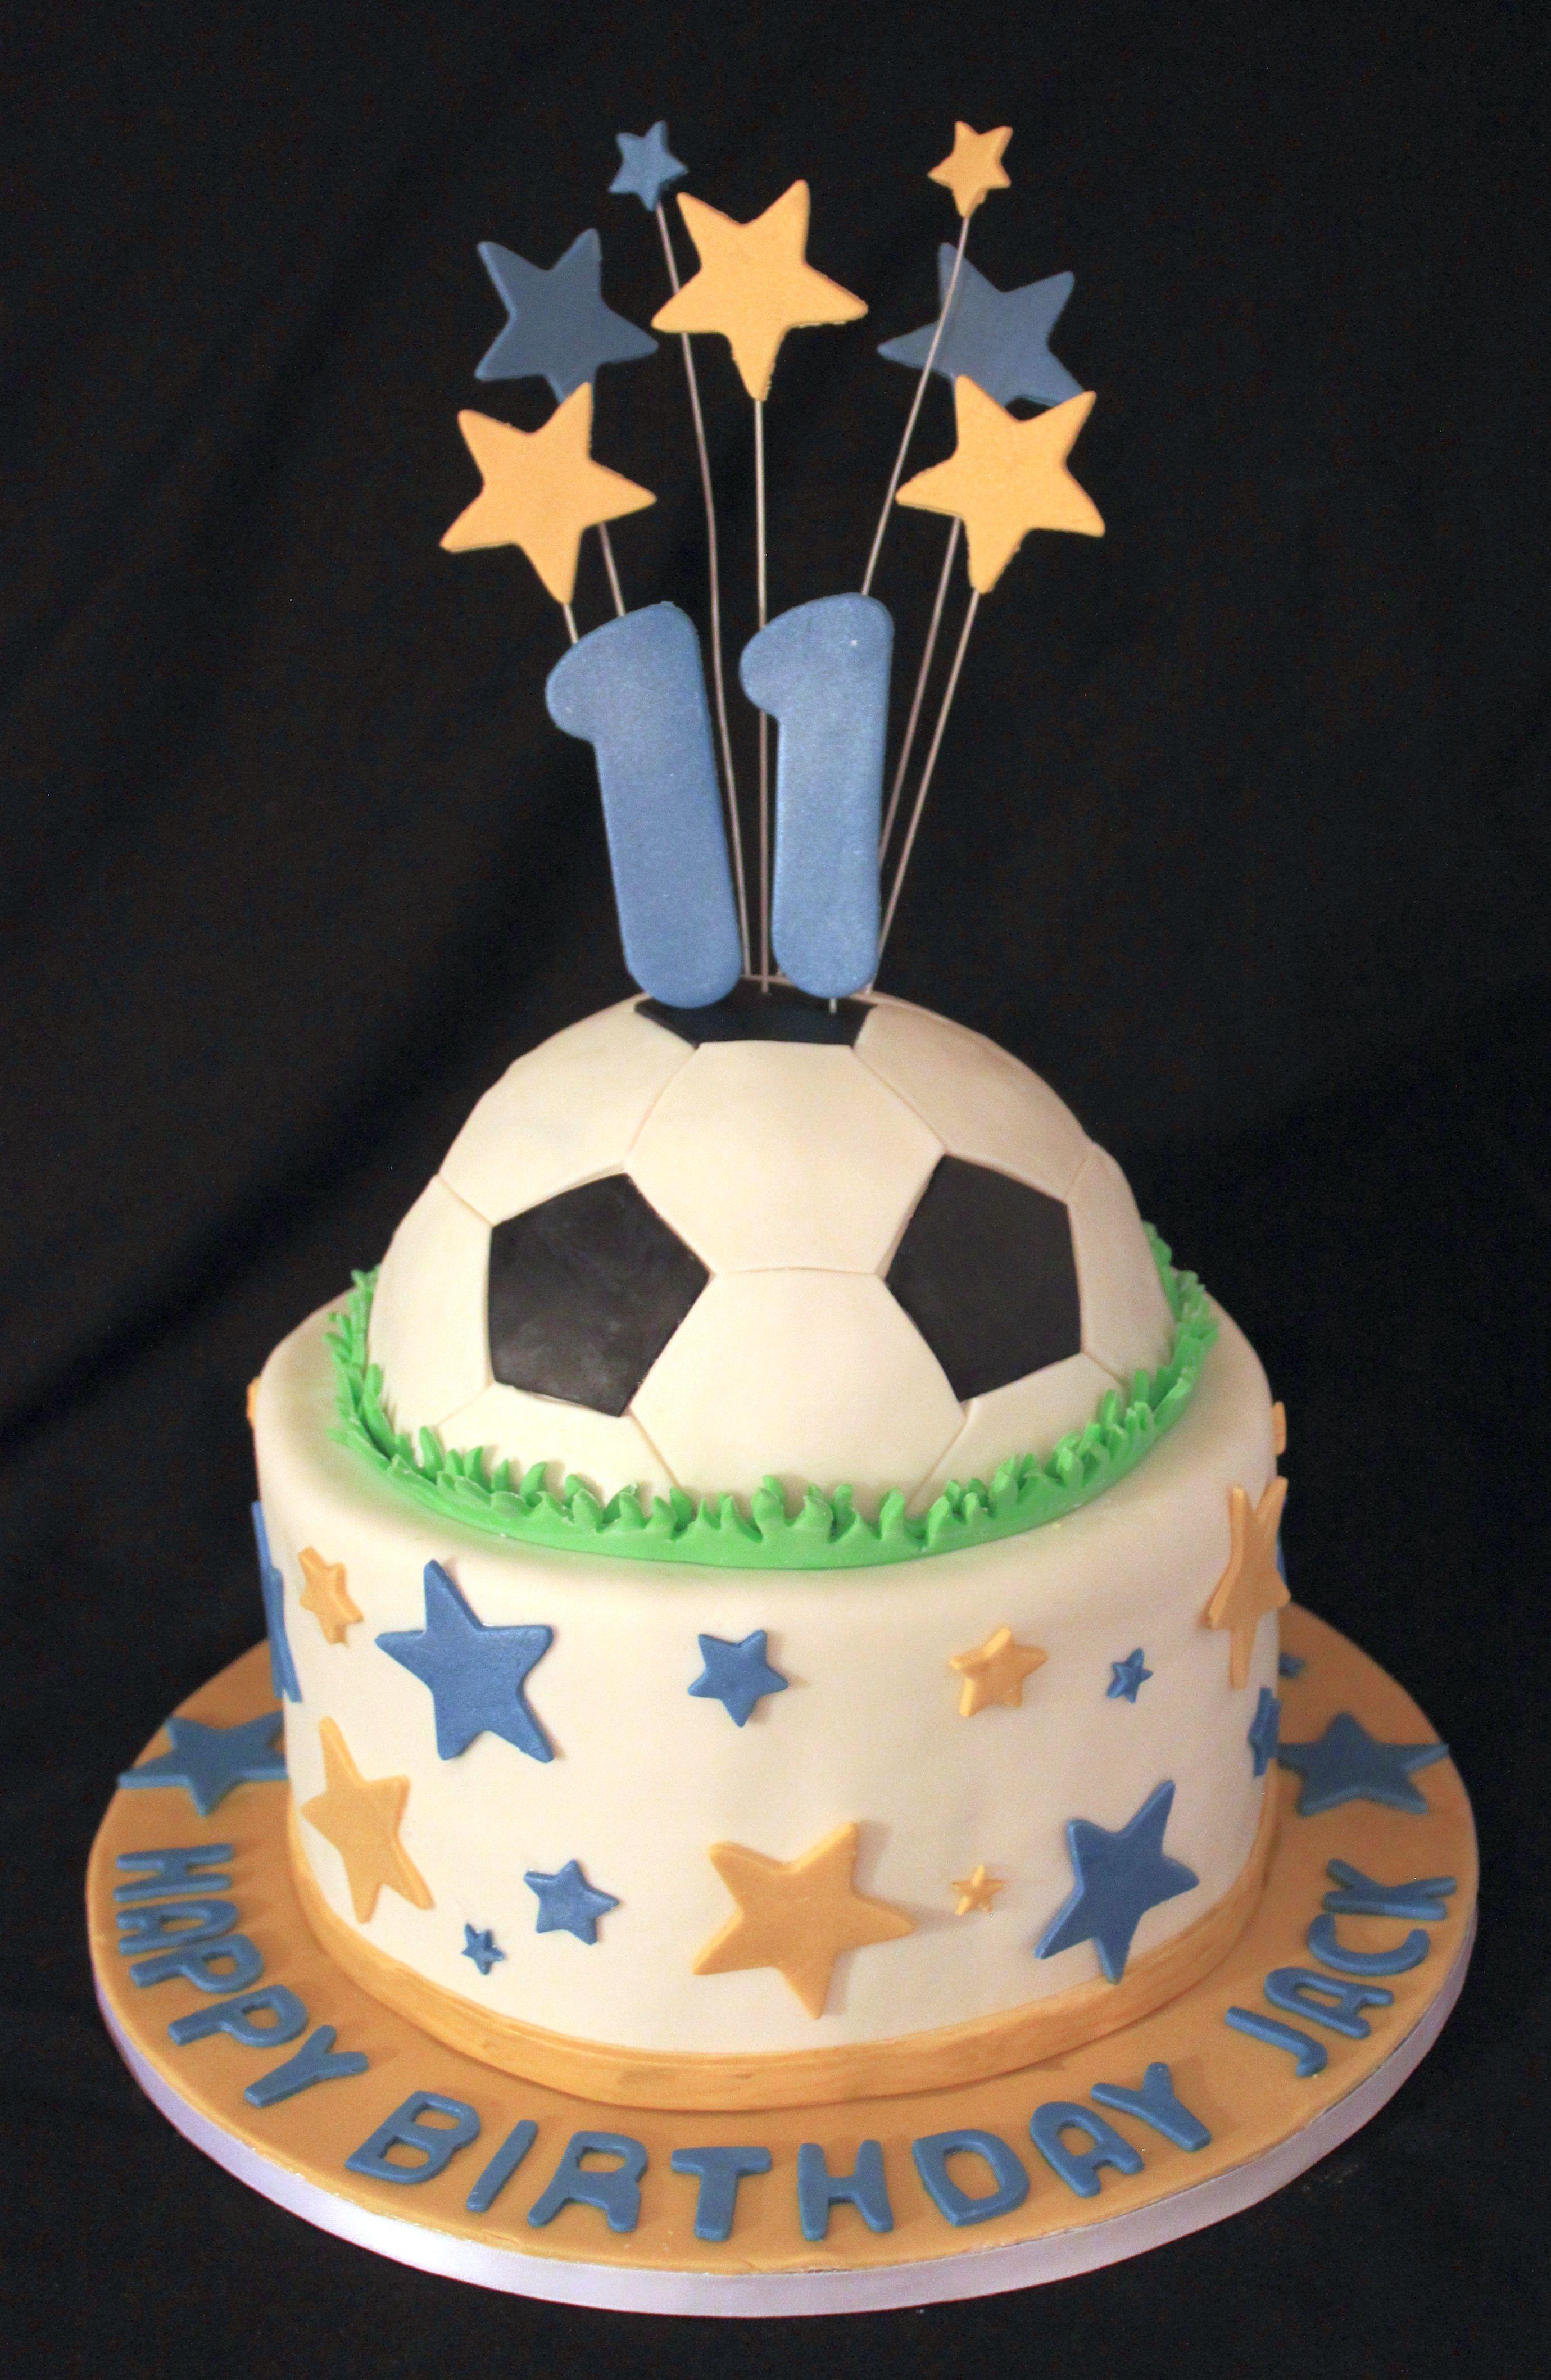 Soccer star birthday